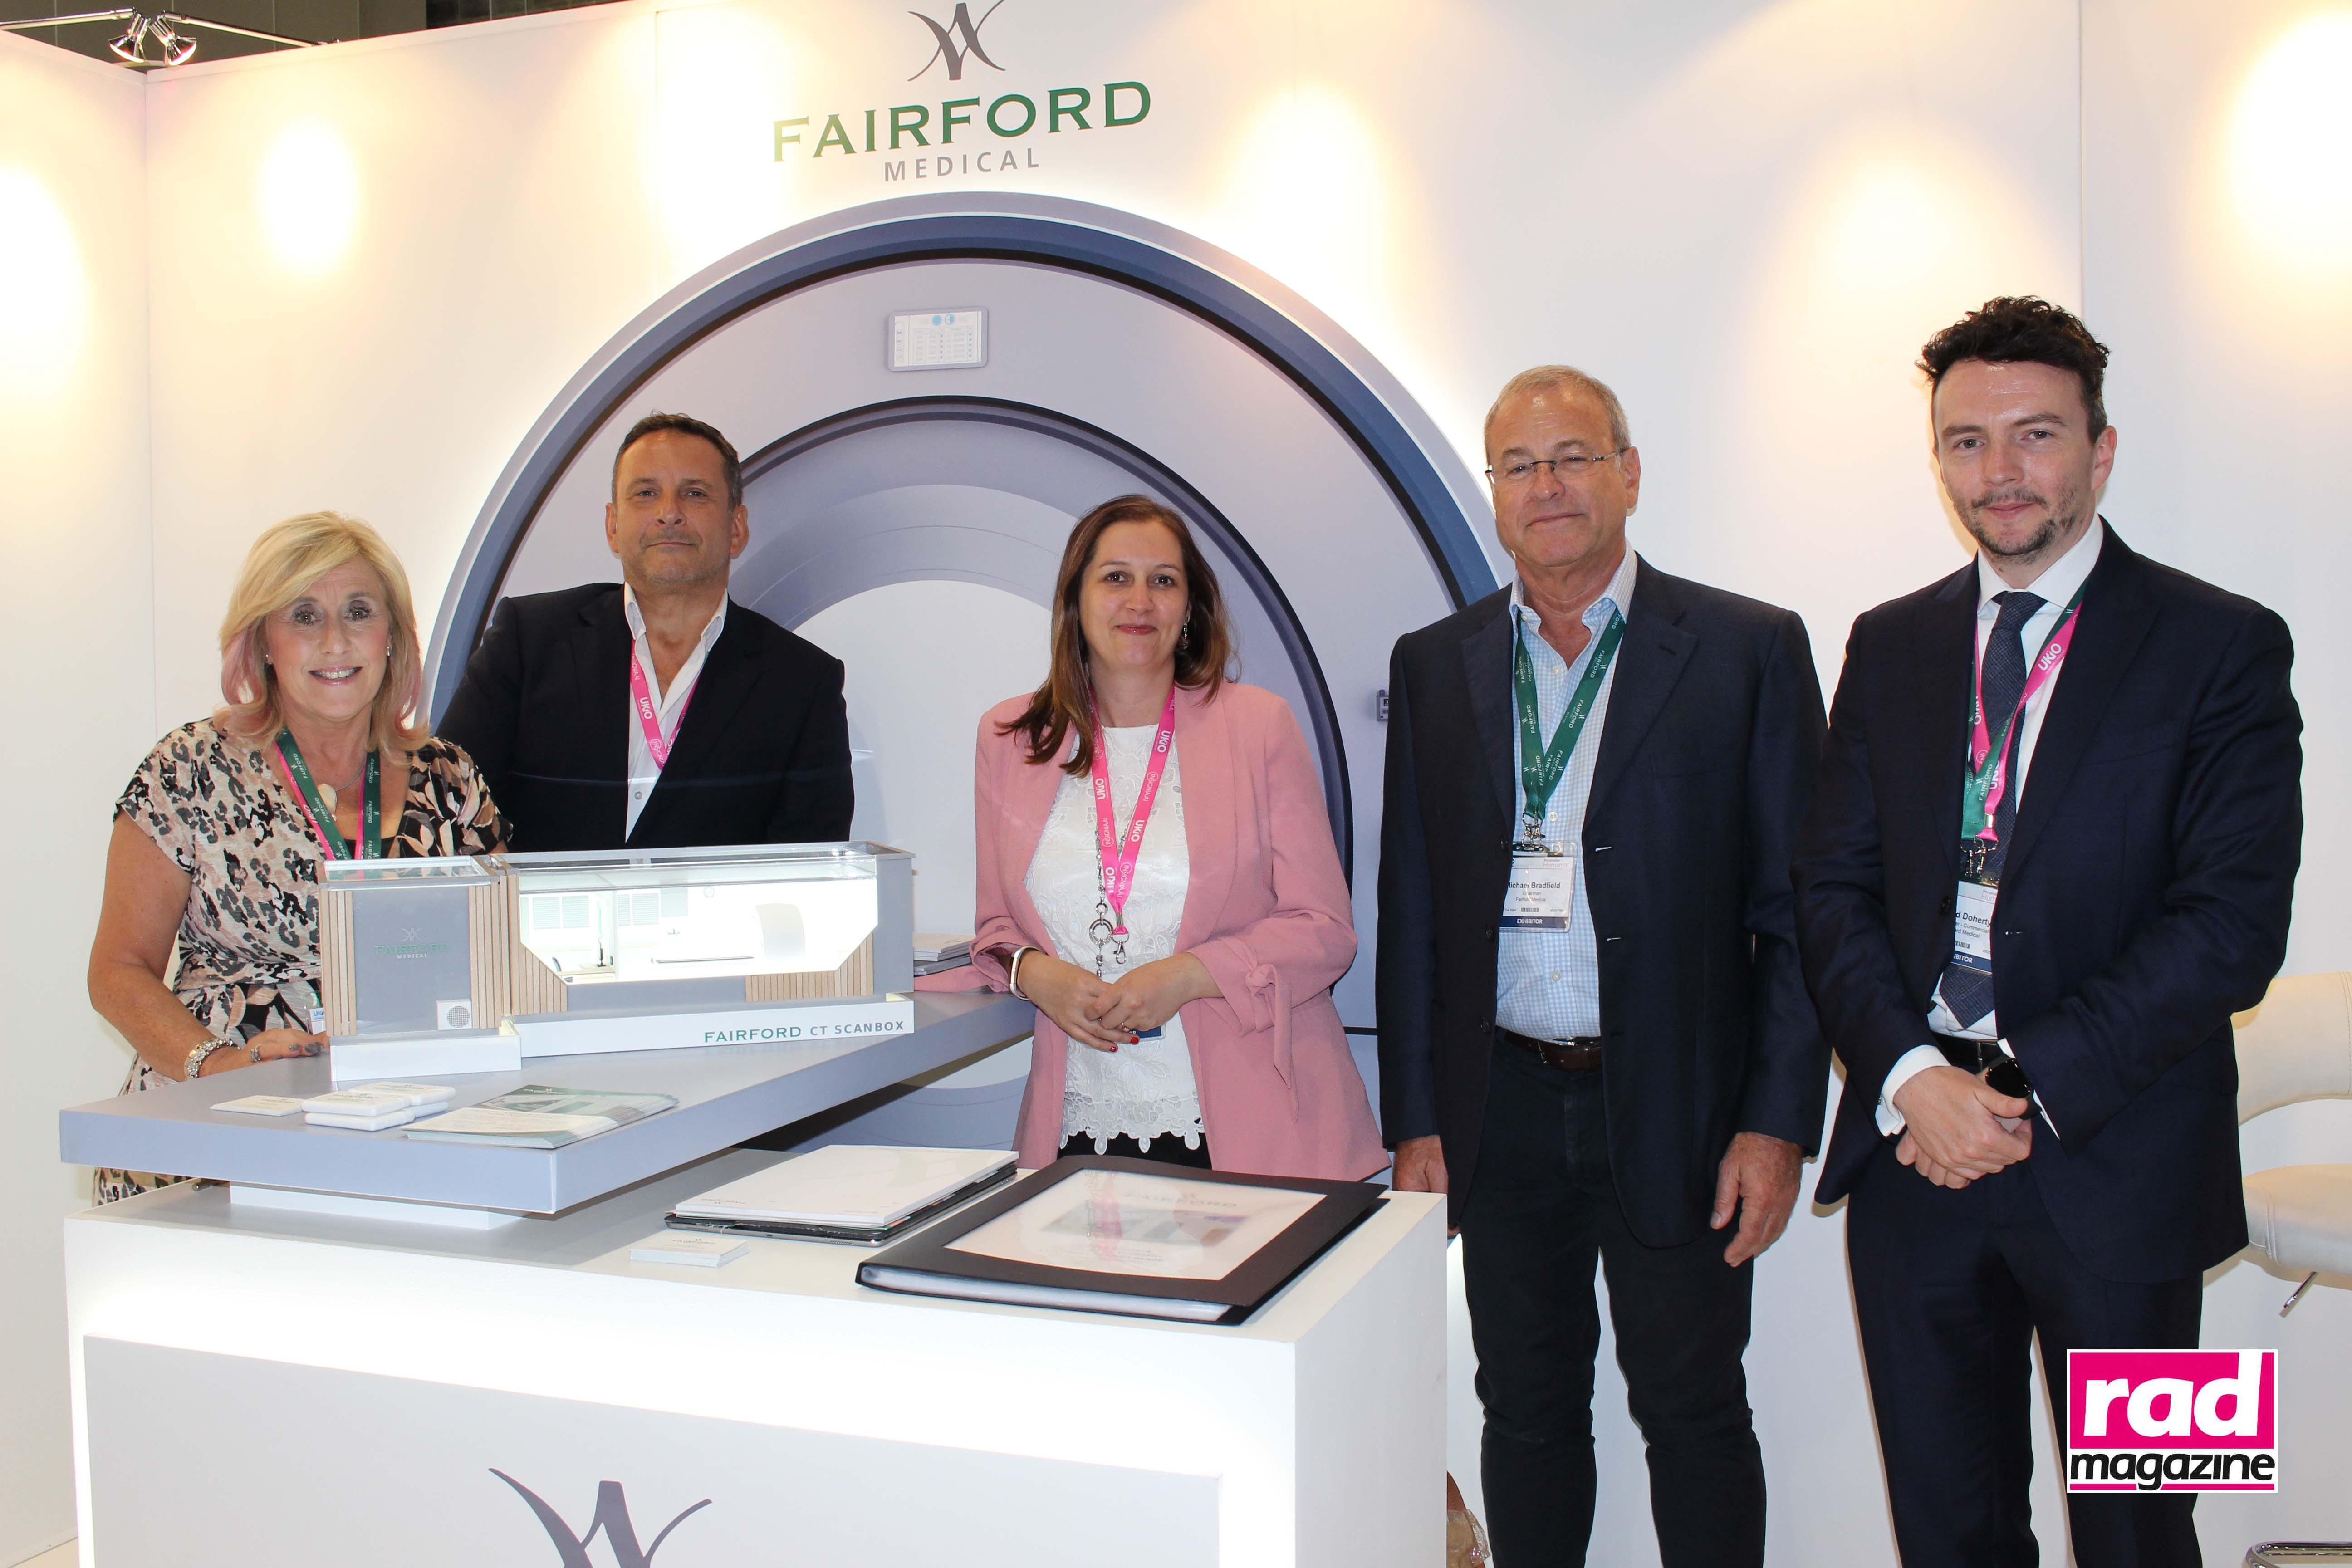 Fairford Medical